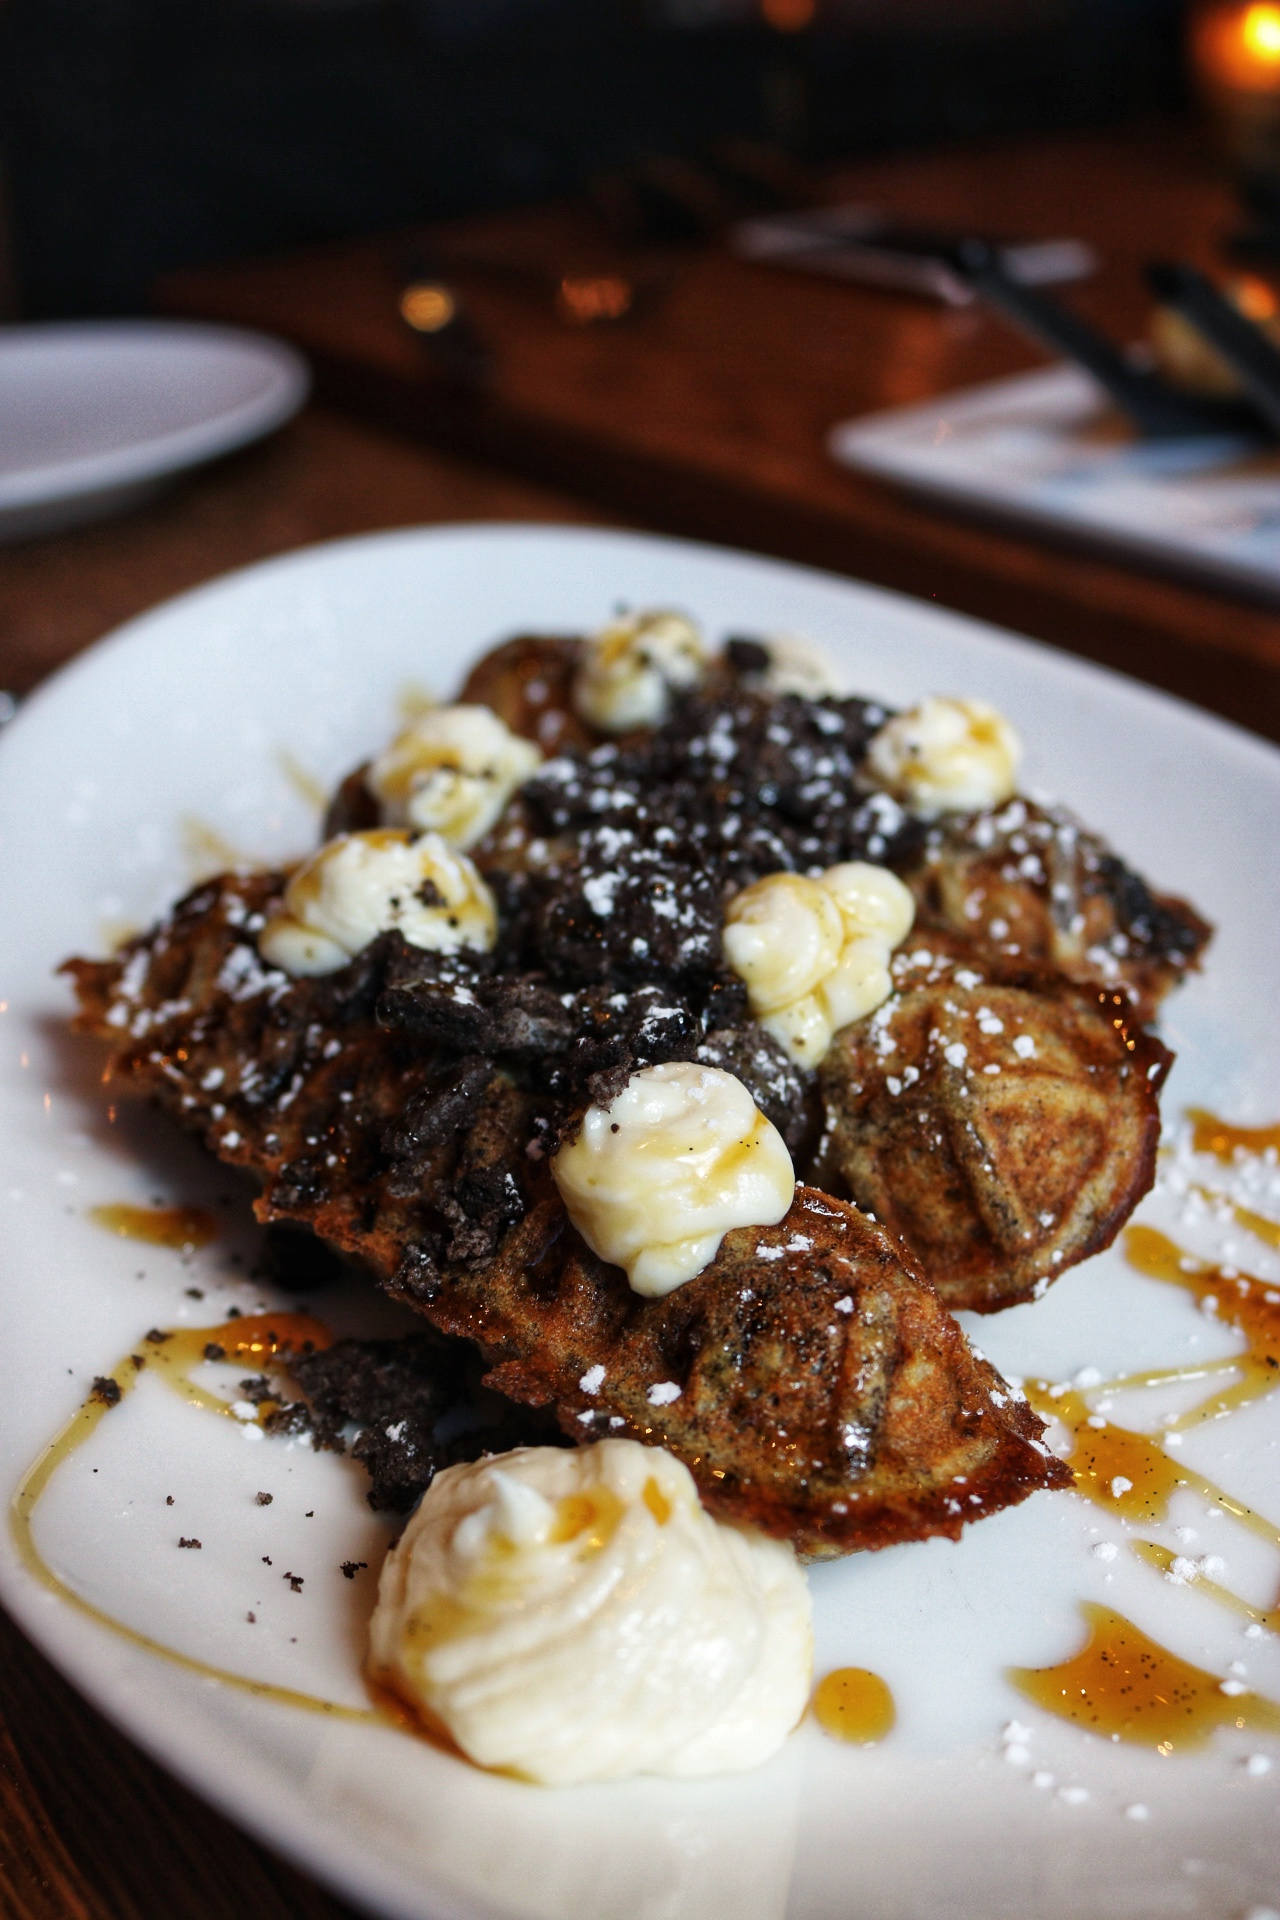 Oreo Cheesecake Waffles vandal